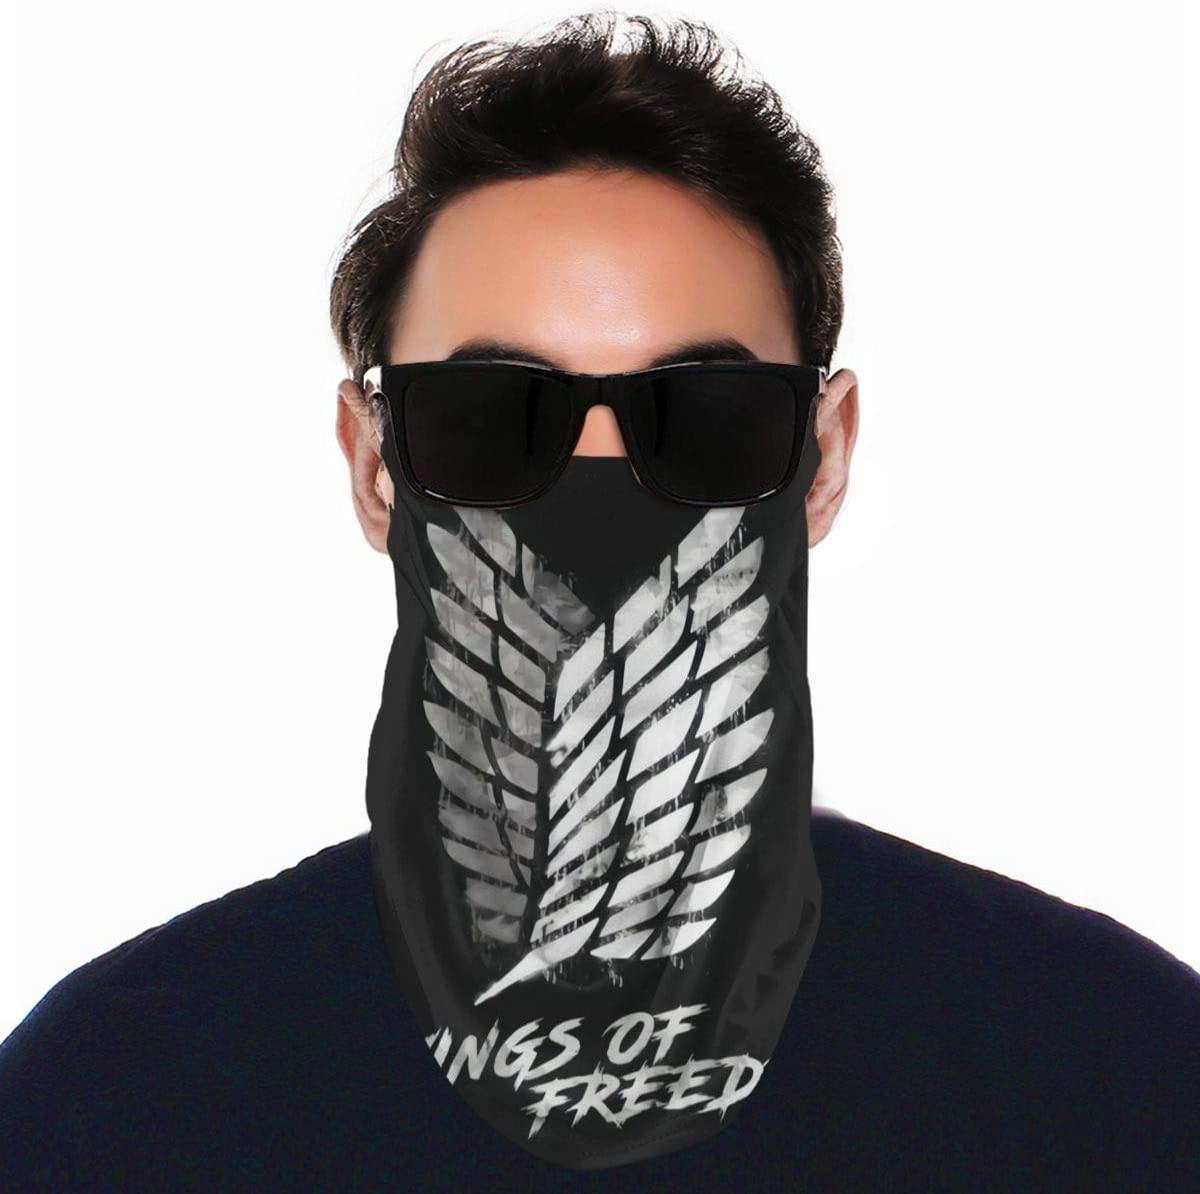 Attack on Titan Cycling Face Mask Motor Neck Gaiter Tube Scarf Balaclava Bandana